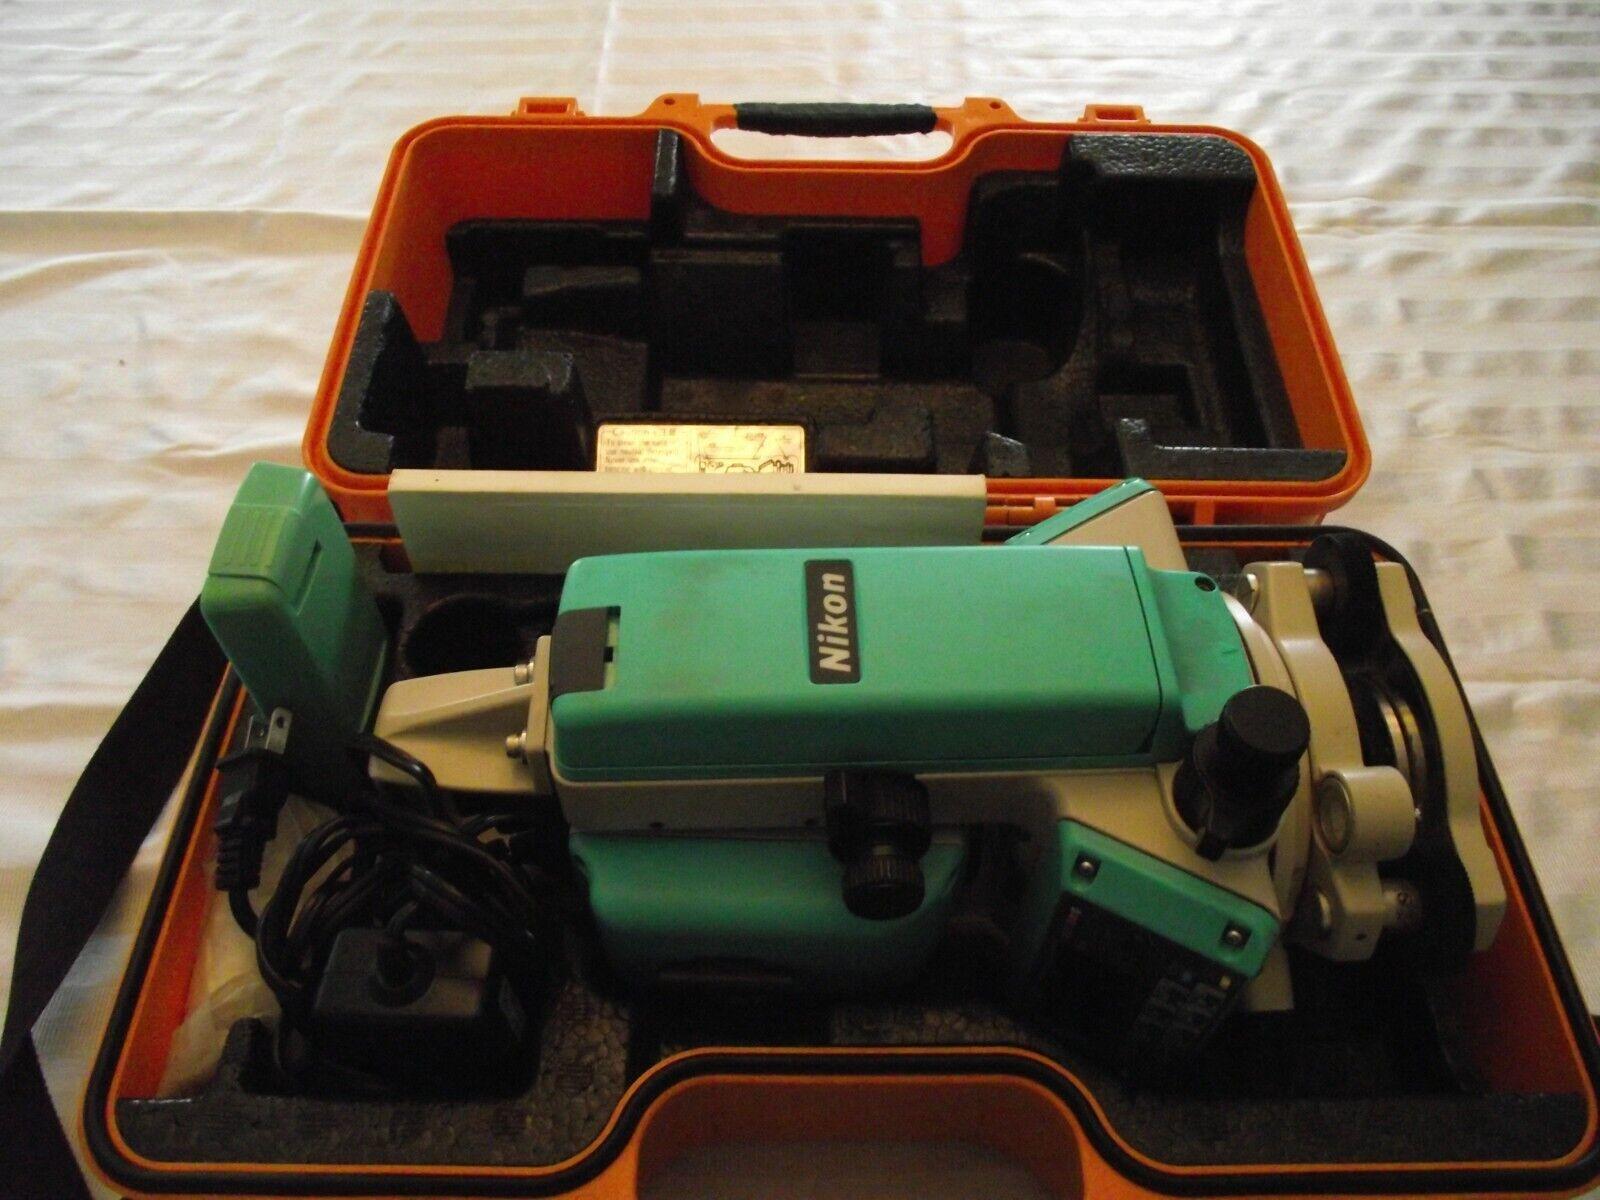 Nikon Total Station DTM-350; Surveying Equipment